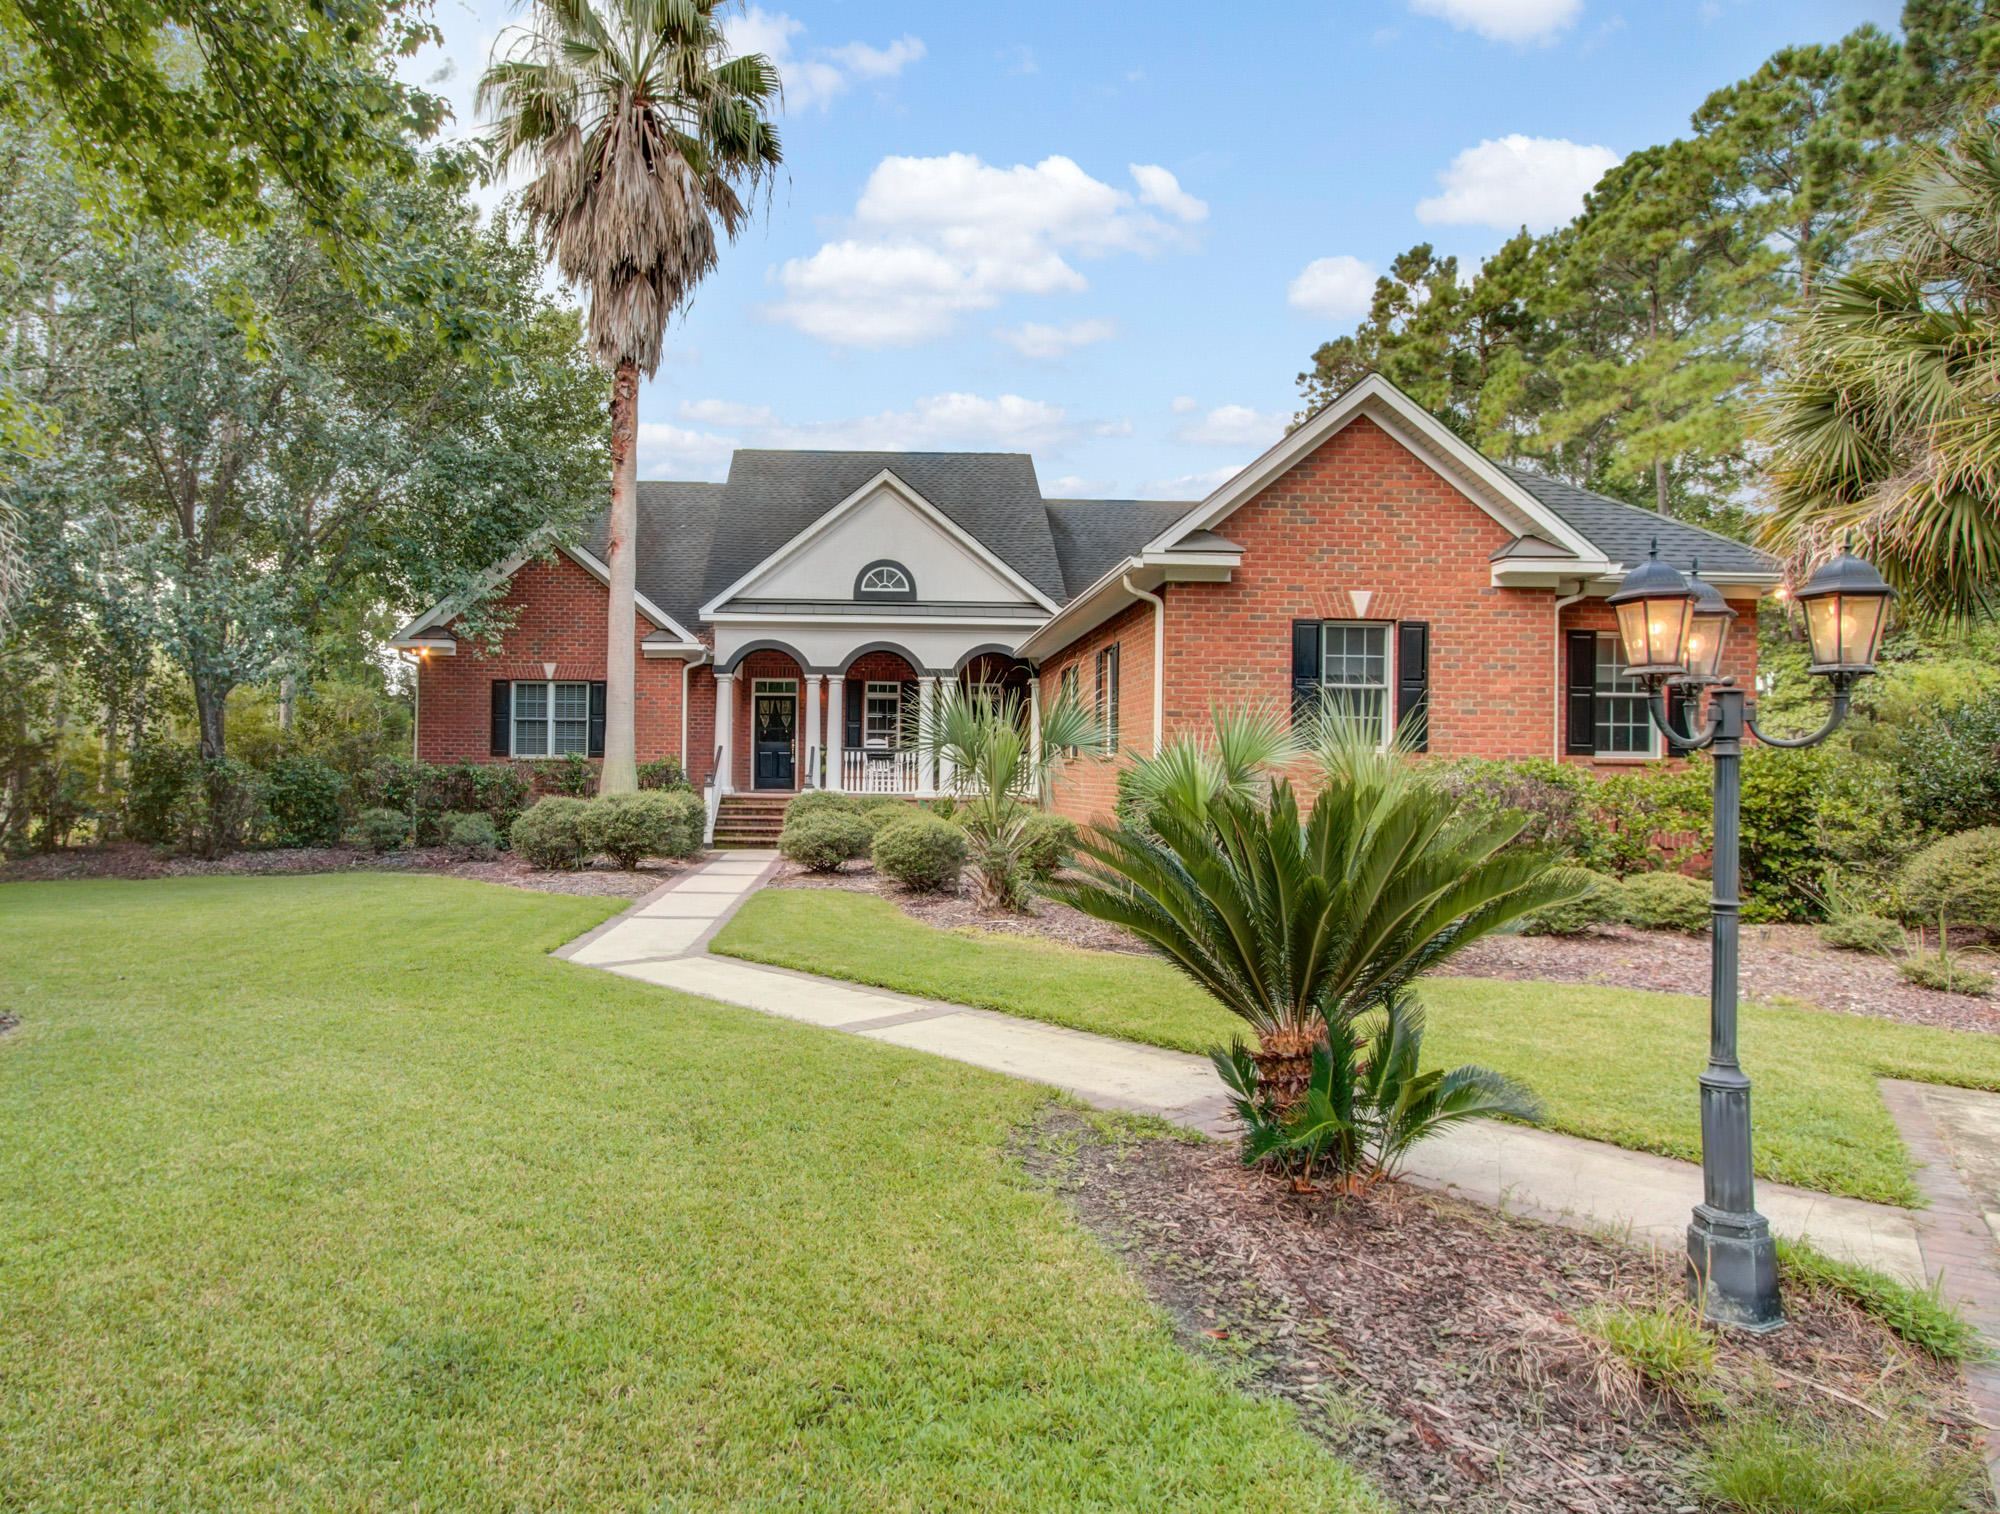 Dunes West Homes For Sale - 3136 Pignatelli, Mount Pleasant, SC - 4